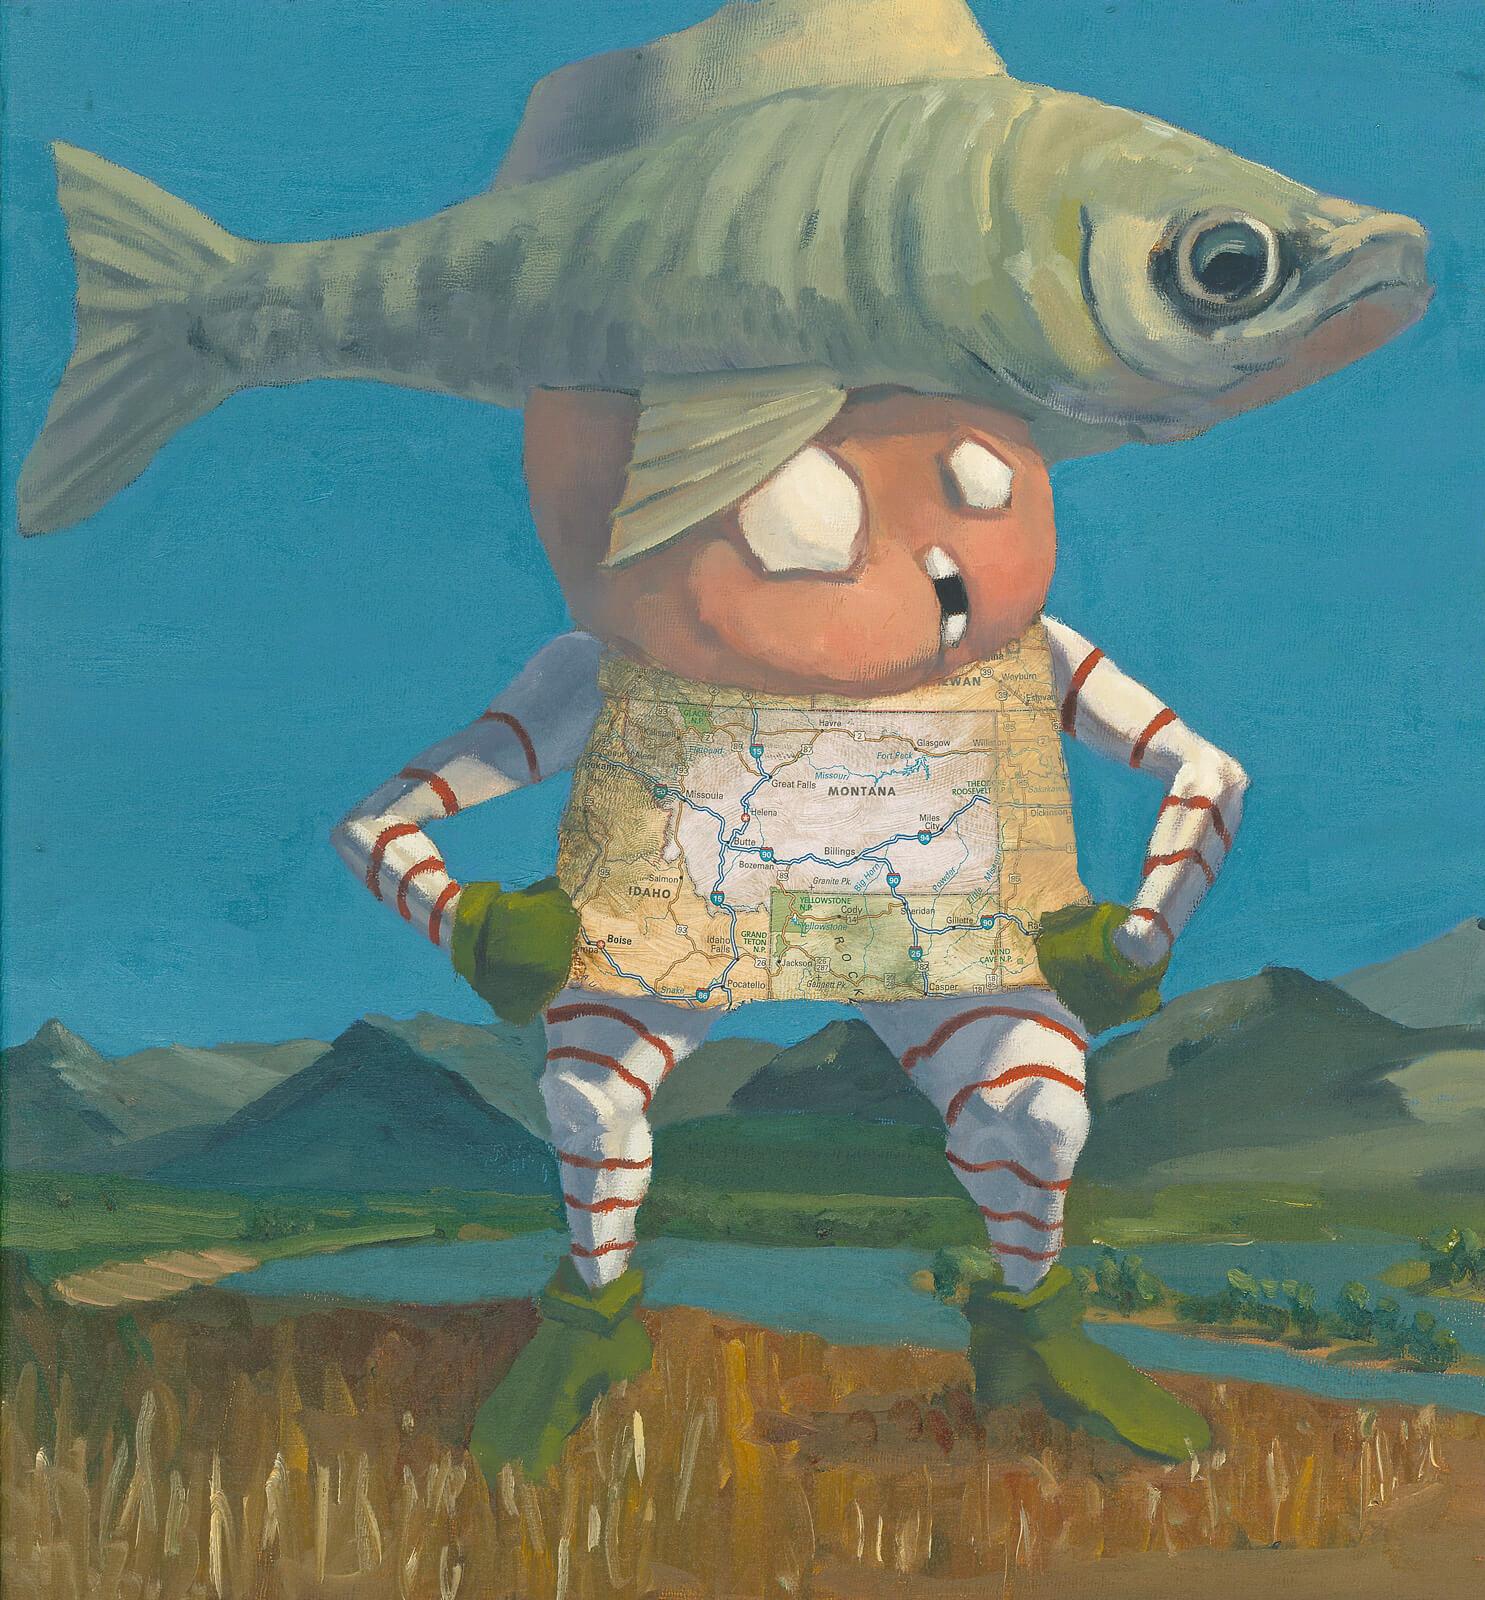 Mr. Montana (Fish Hat)